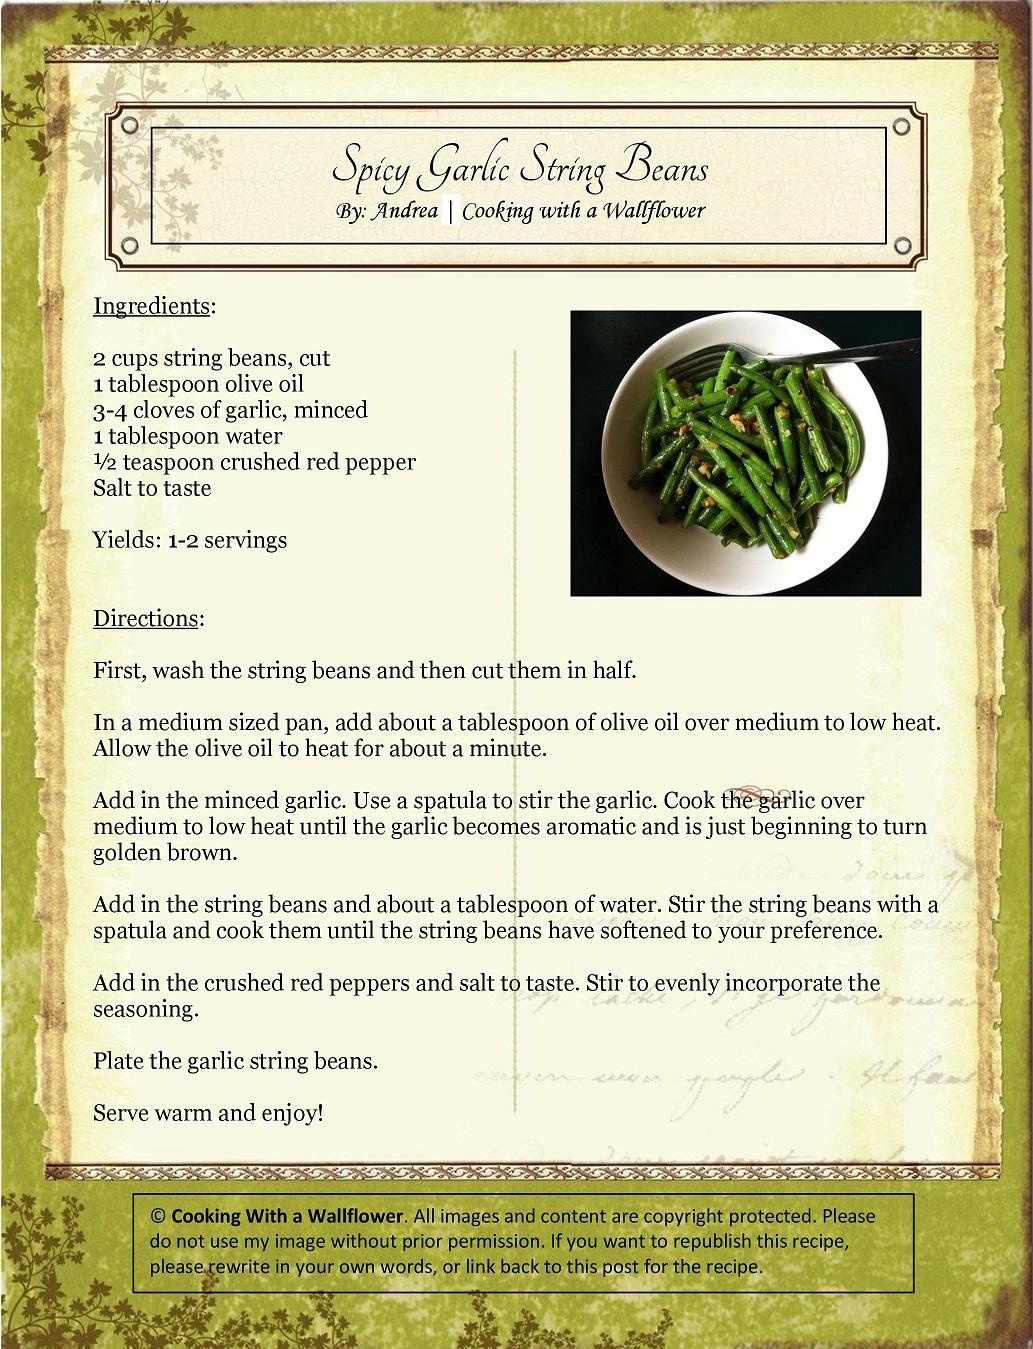 Spicy Garlic String Beans Recipe Card